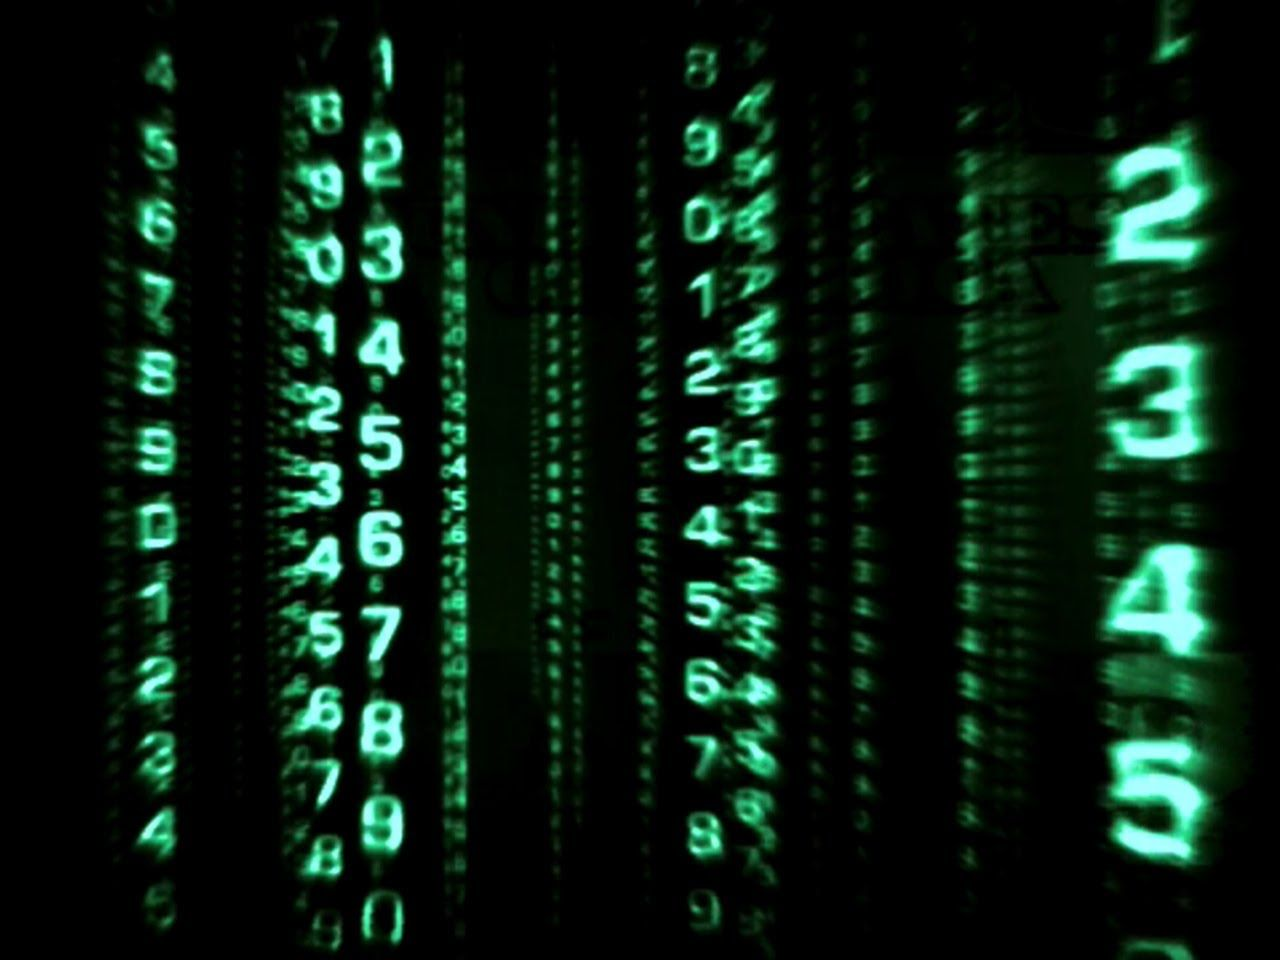 Stuxnet Computer worm opens new era of warfare CyberSecurity 1280x960